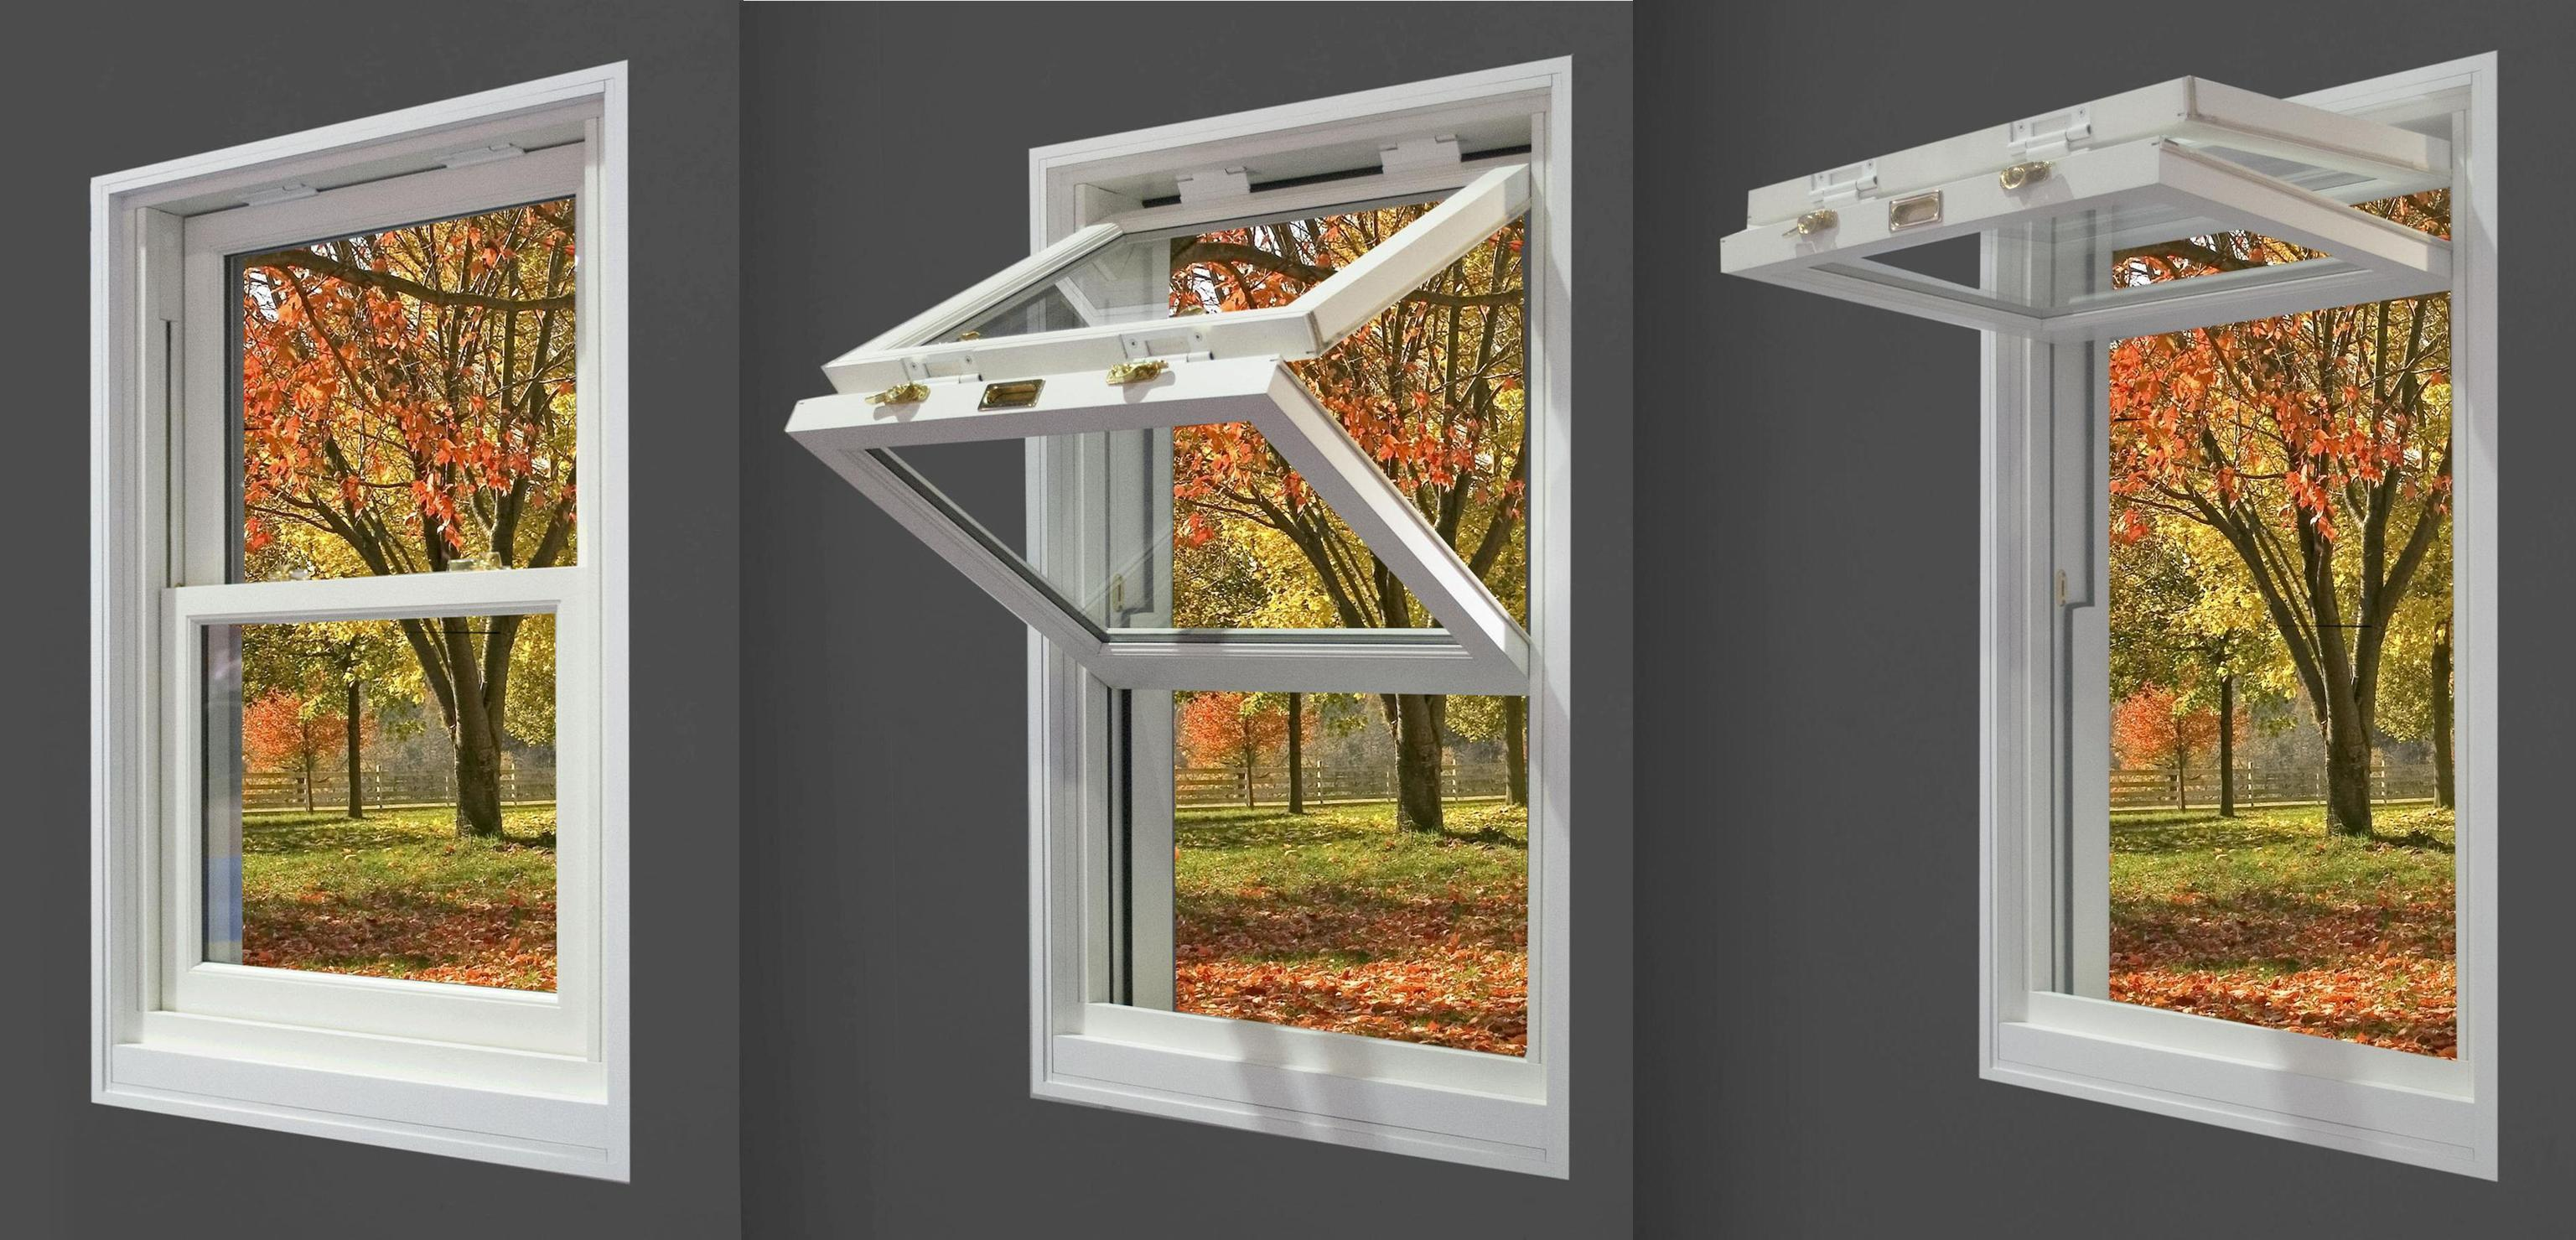 Foldup Windows Folding Windows Windows That Fold Up